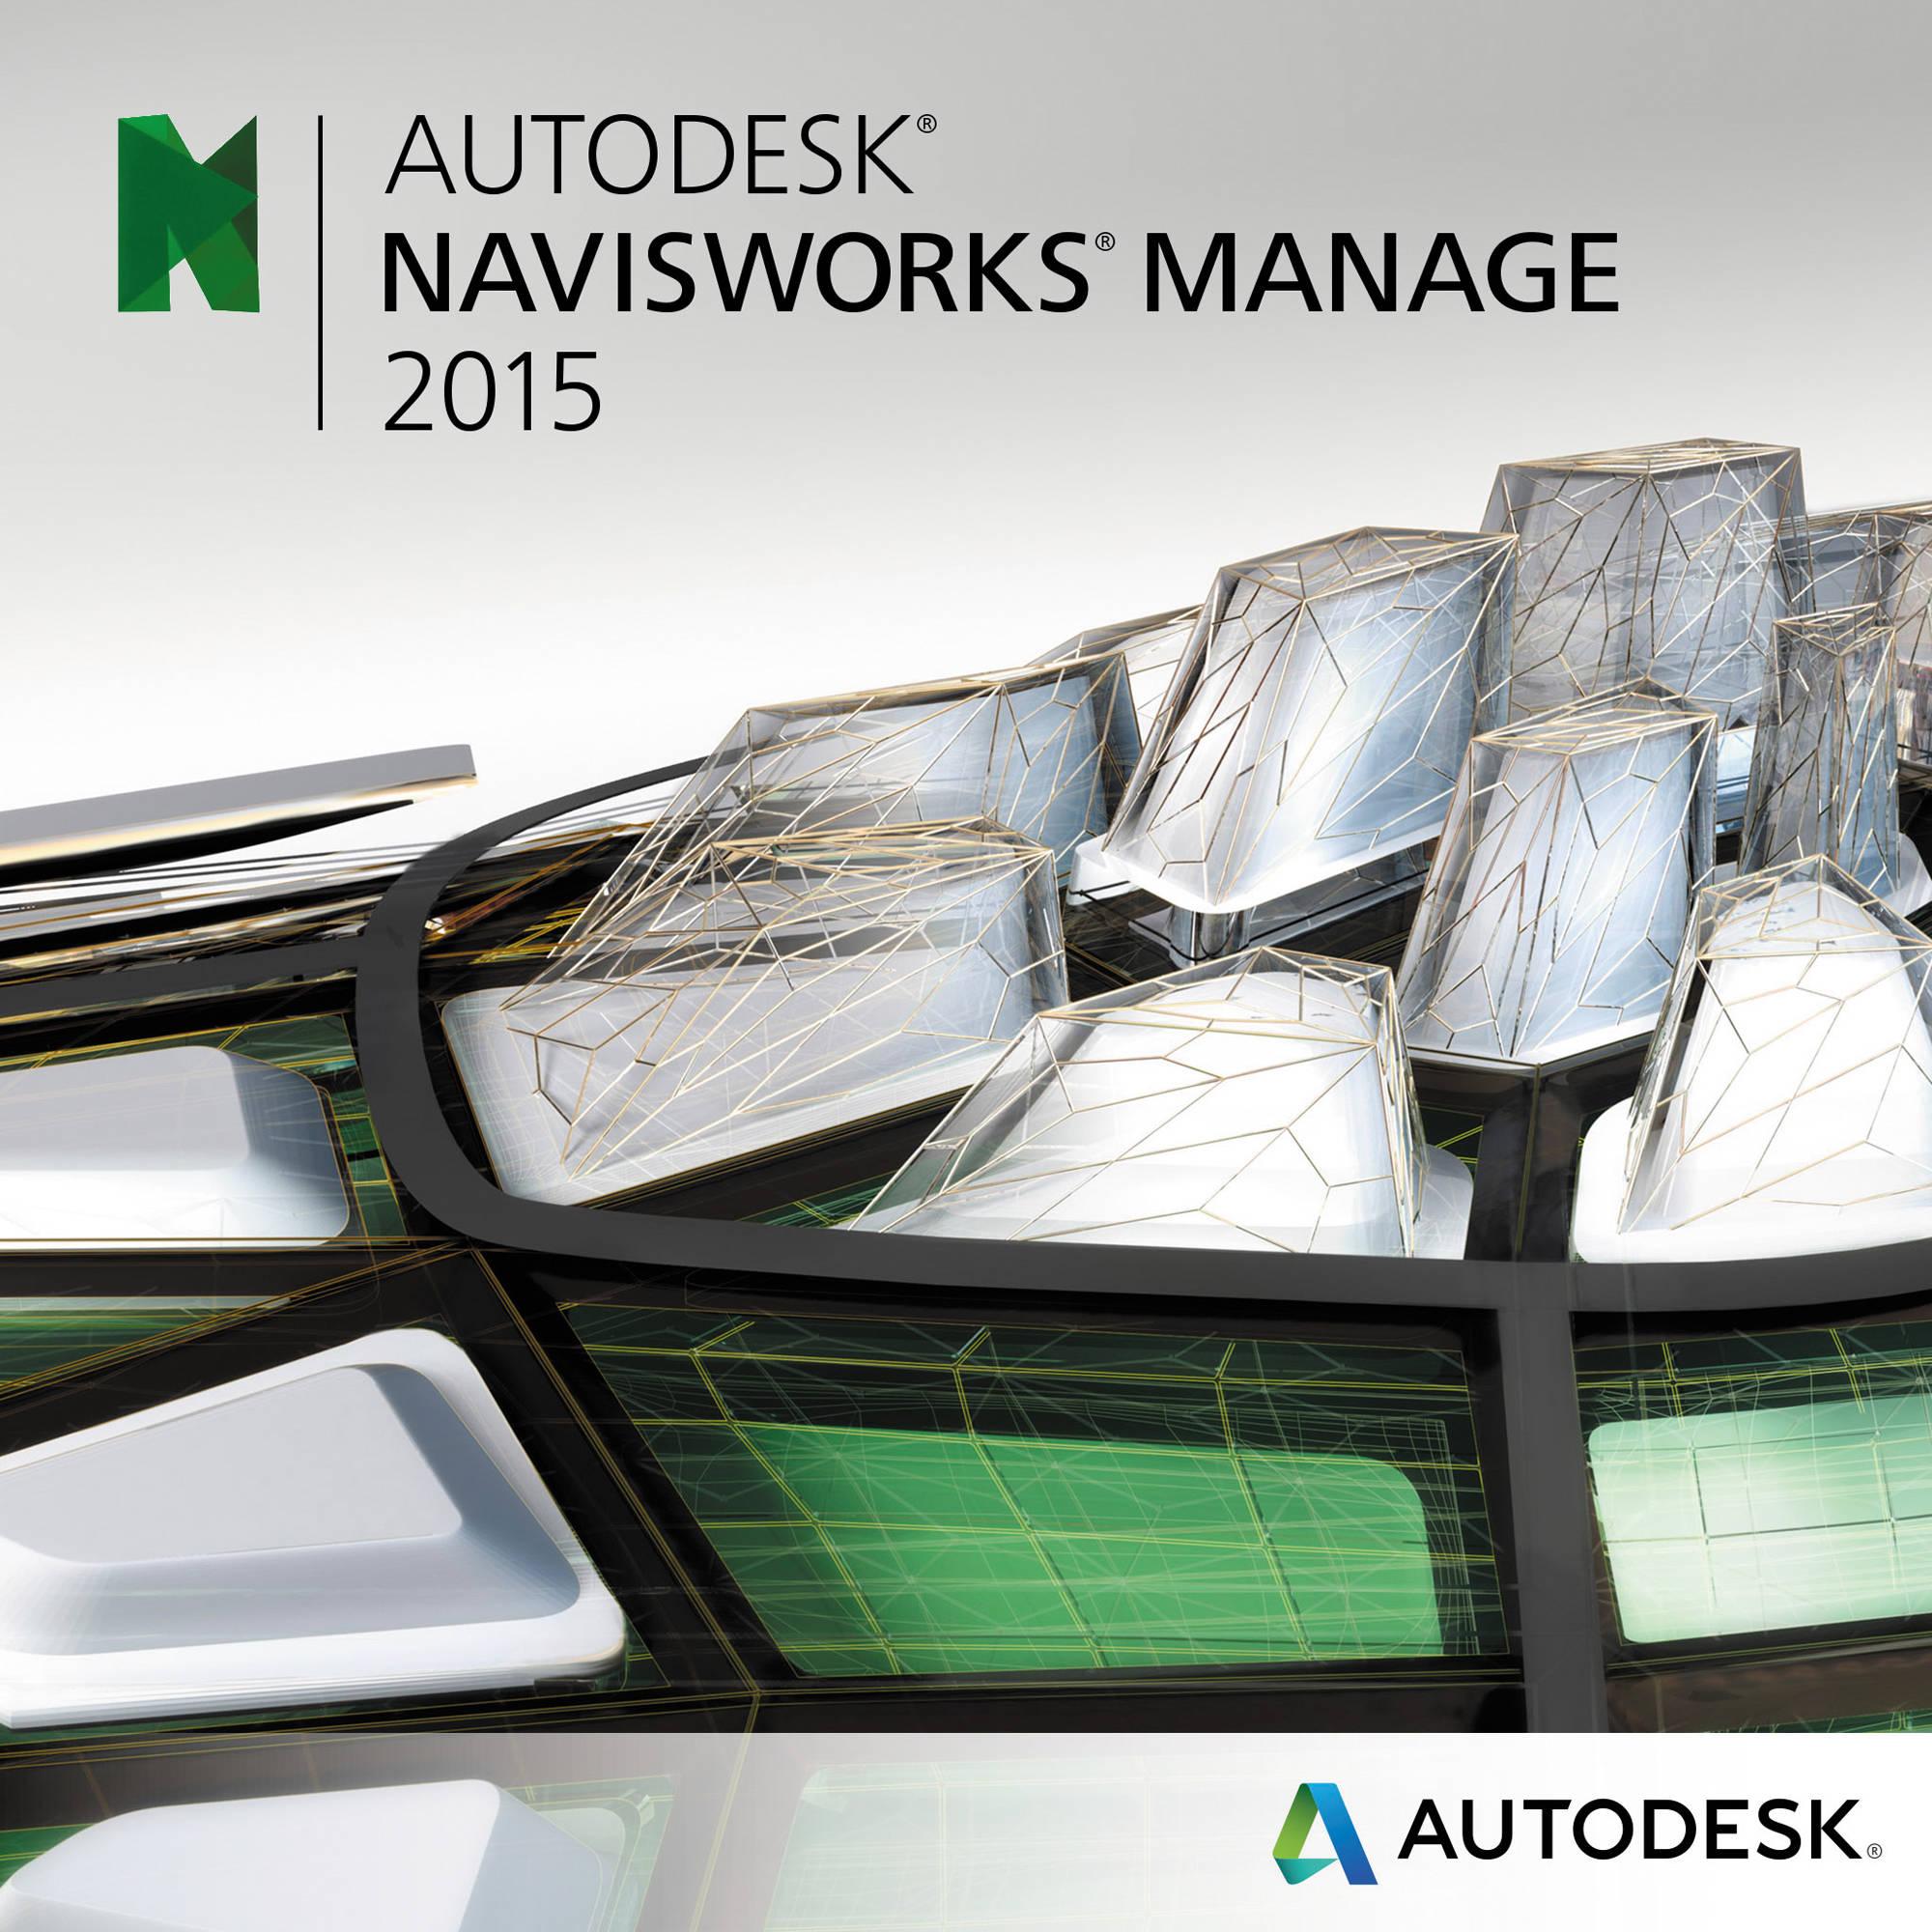 Autodesk Navisworks Simulate 2015 cheap license